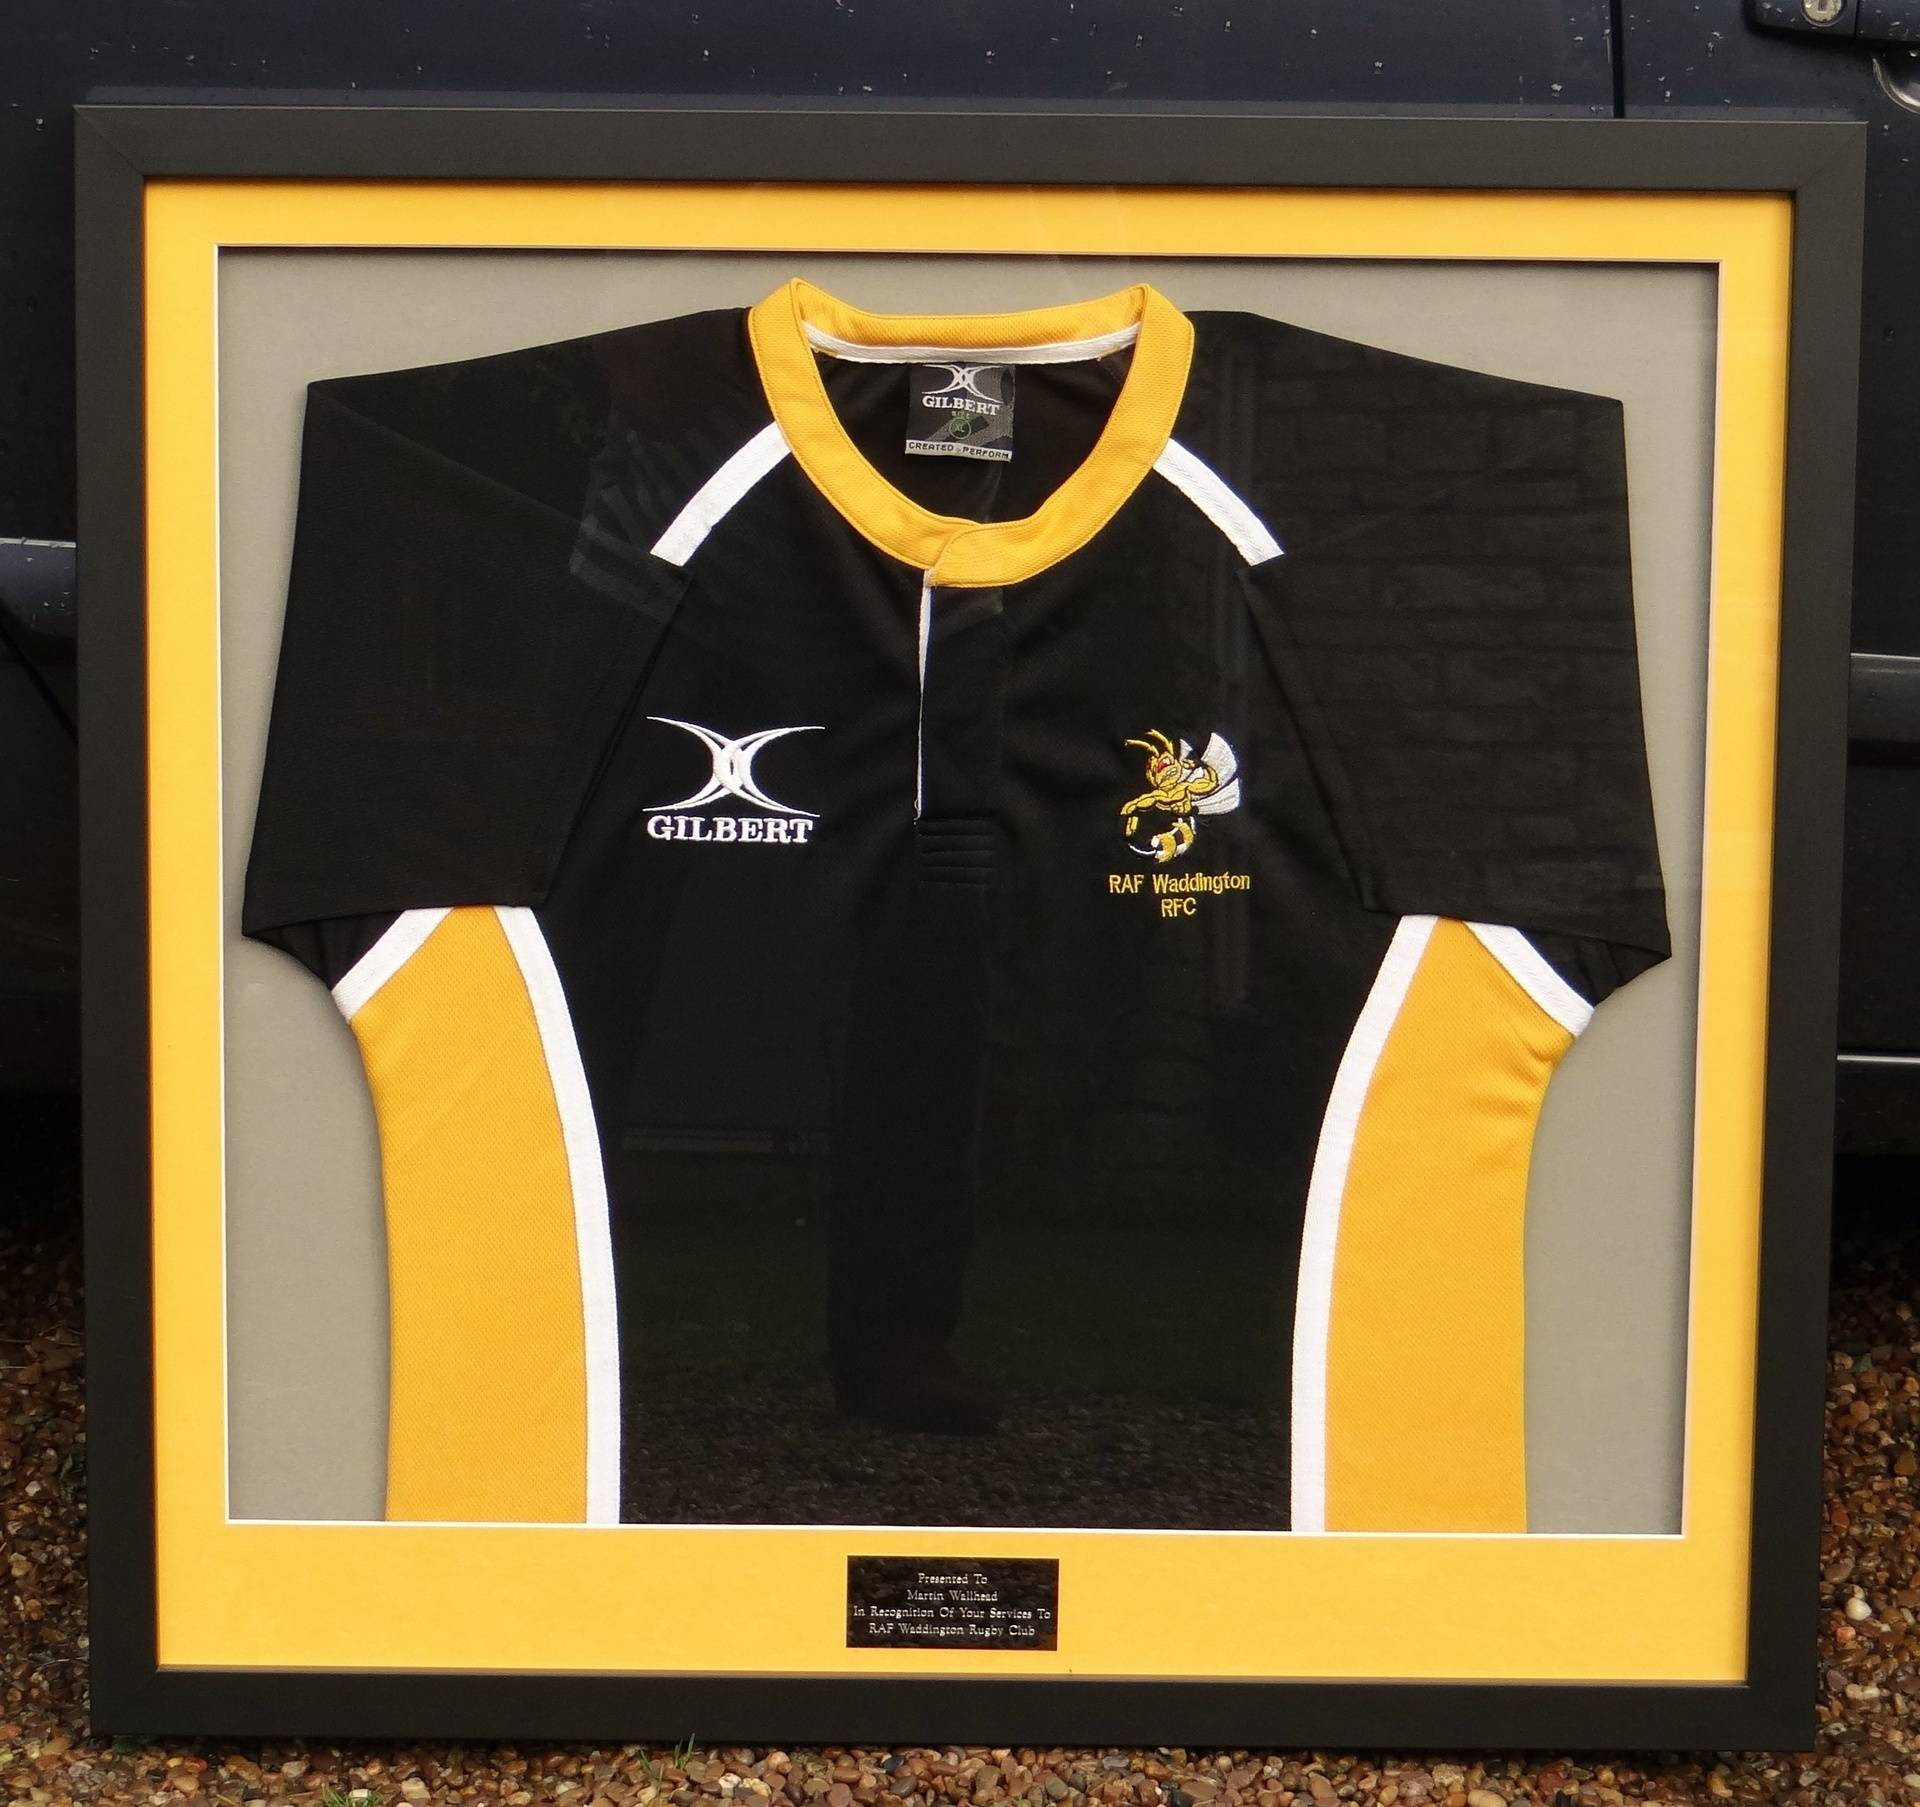 RAF Waddington rugby shirt, Oct 2016